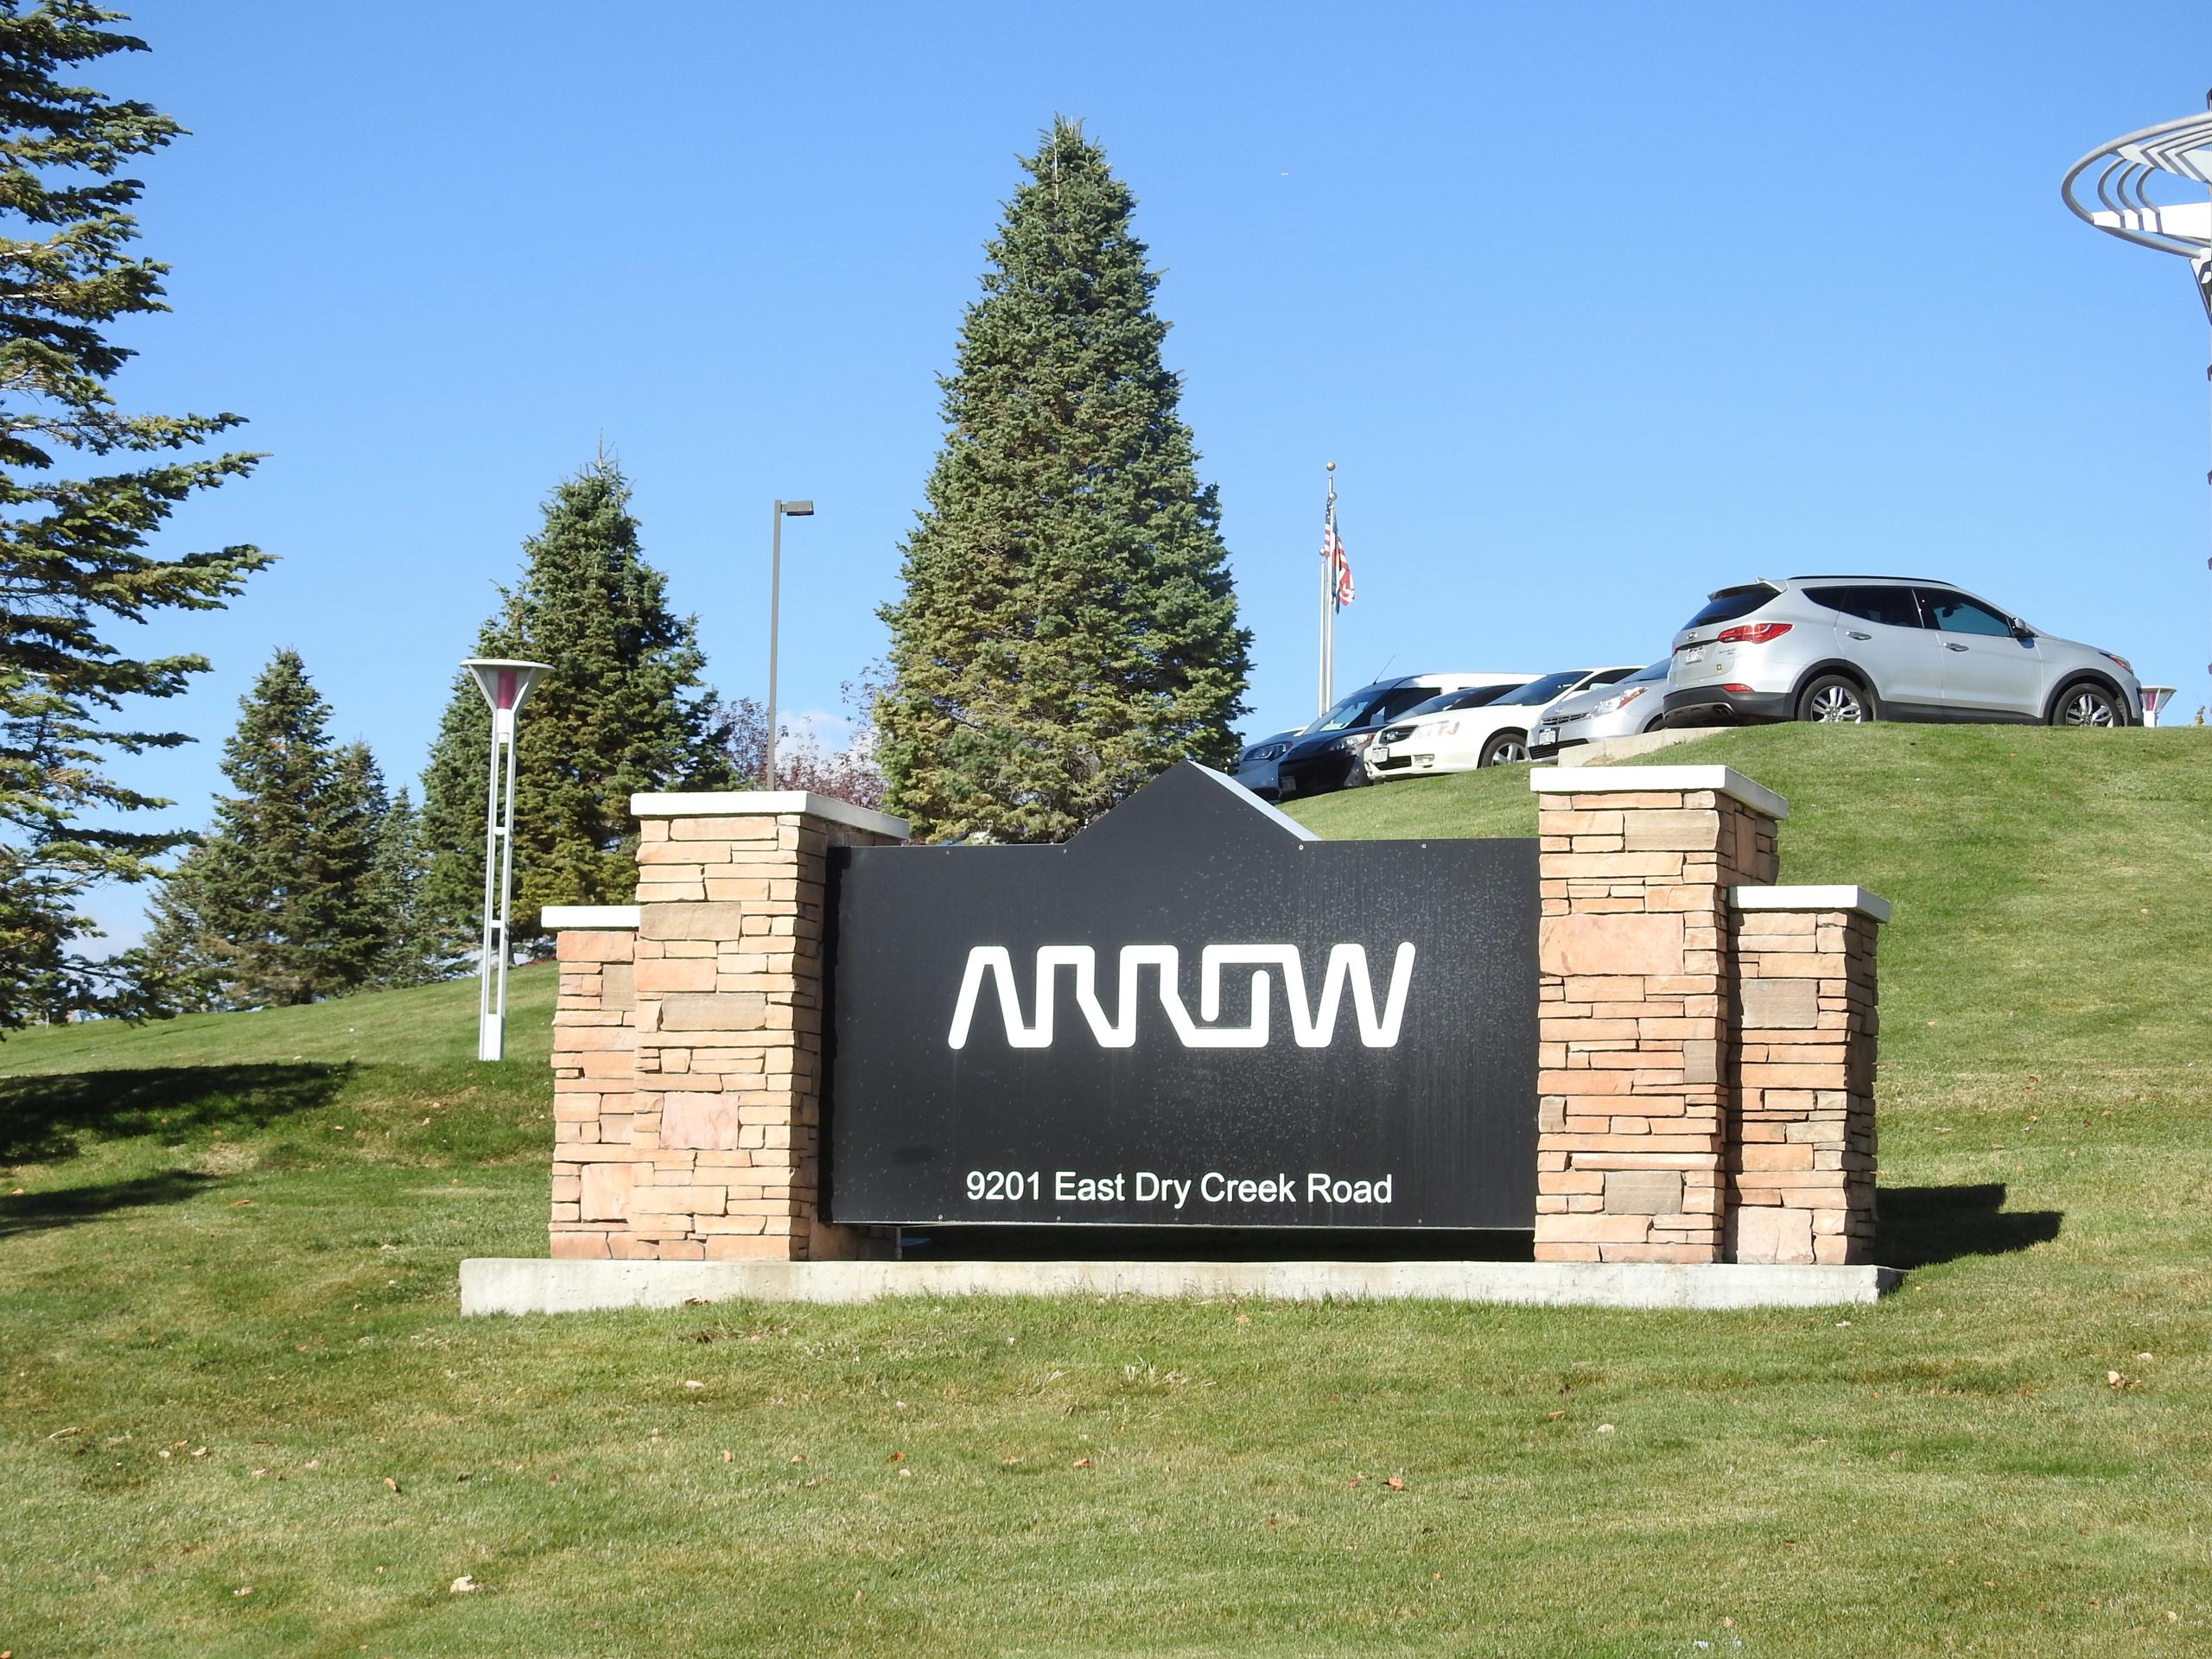 Entrance to Arrow Electronics' corporate headquarters in Centennial, Colorado.